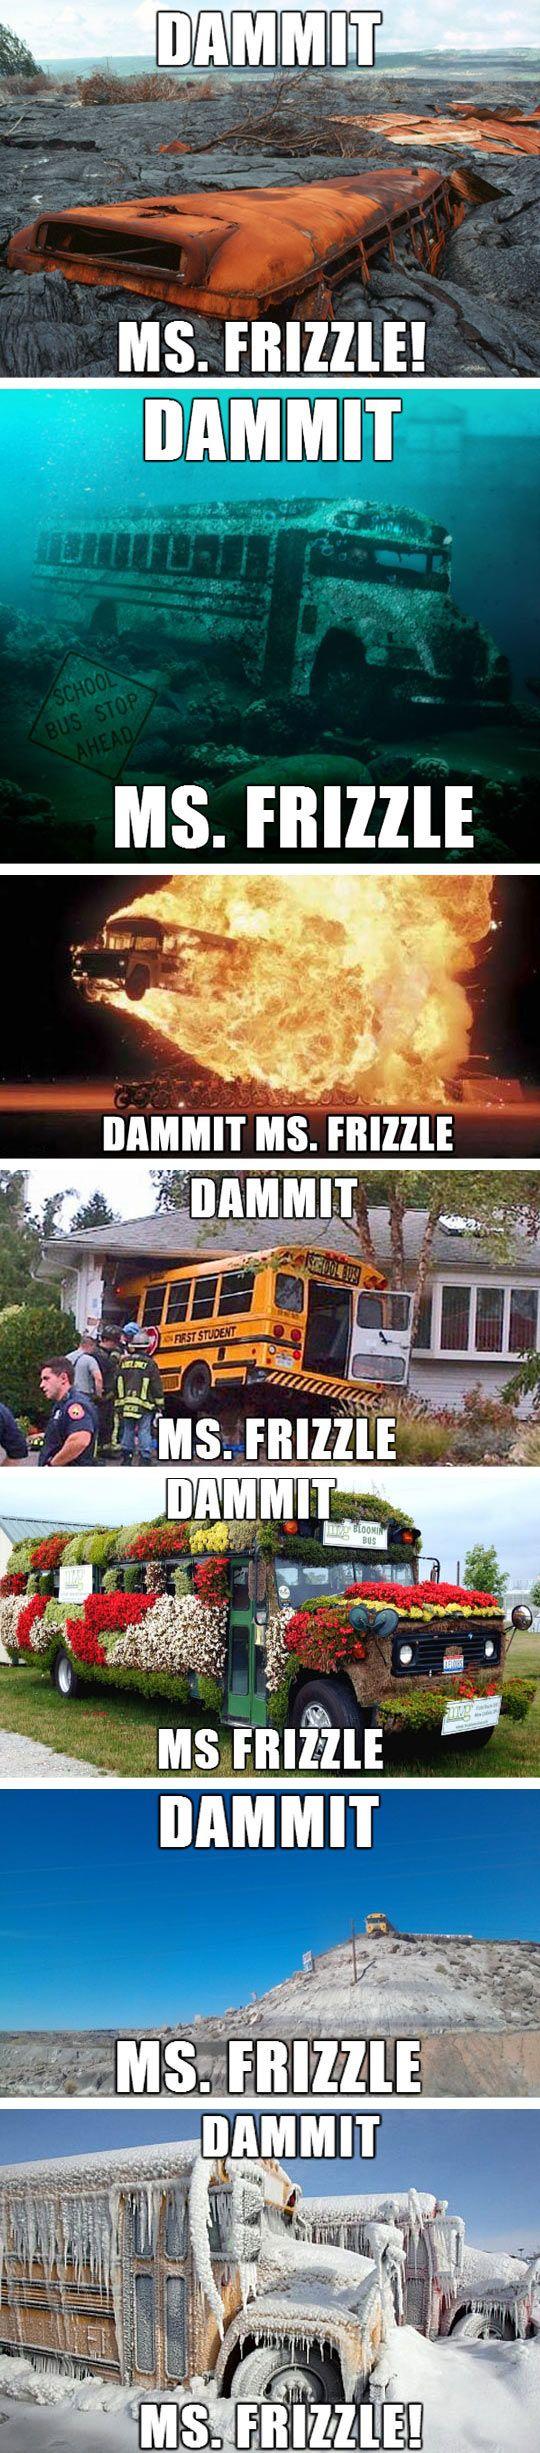 funny Magic School Bus Ms. Frizzle